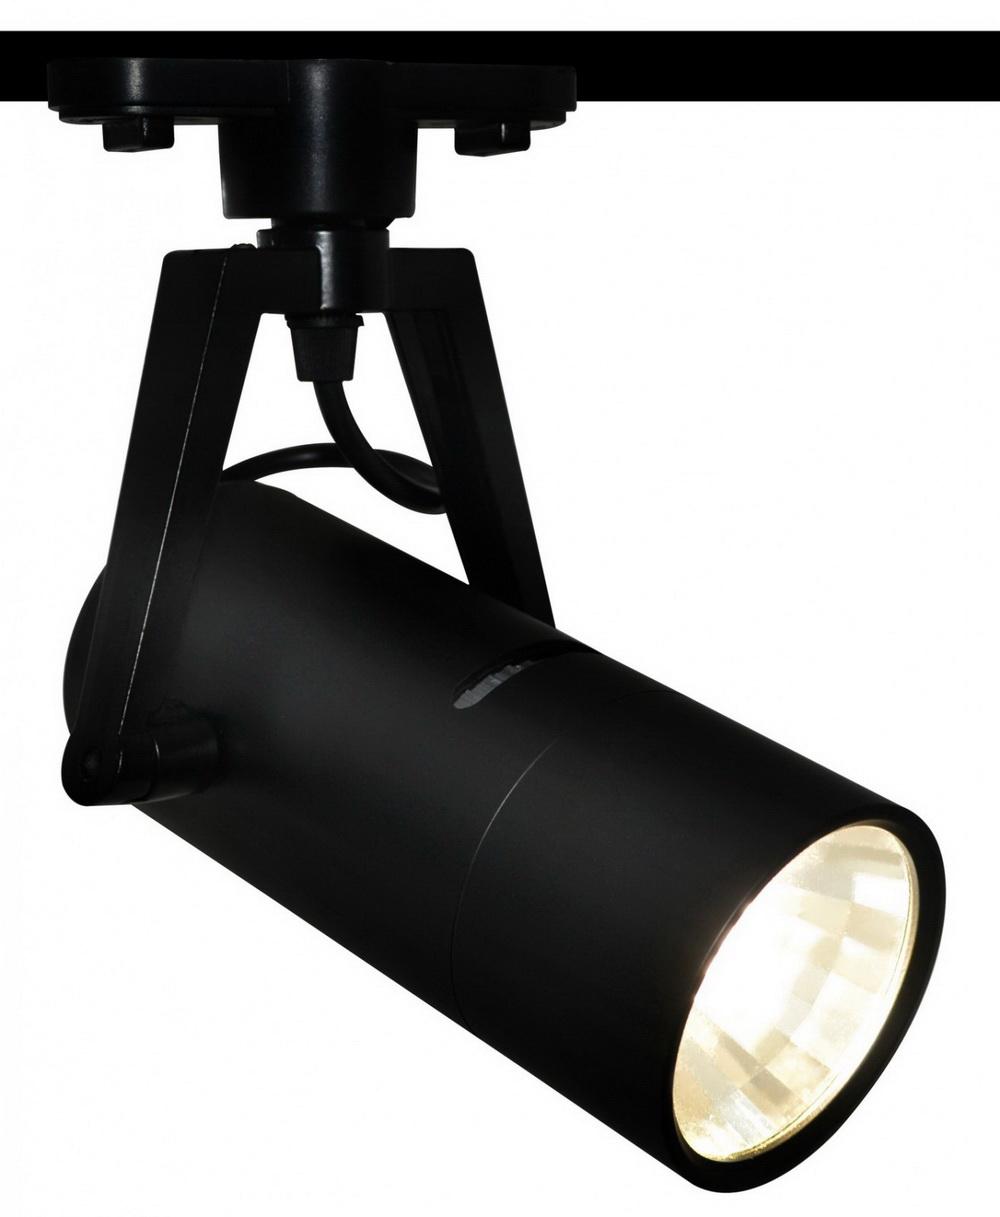 Светильник Arte lamp Track lights a6210pl-1bk